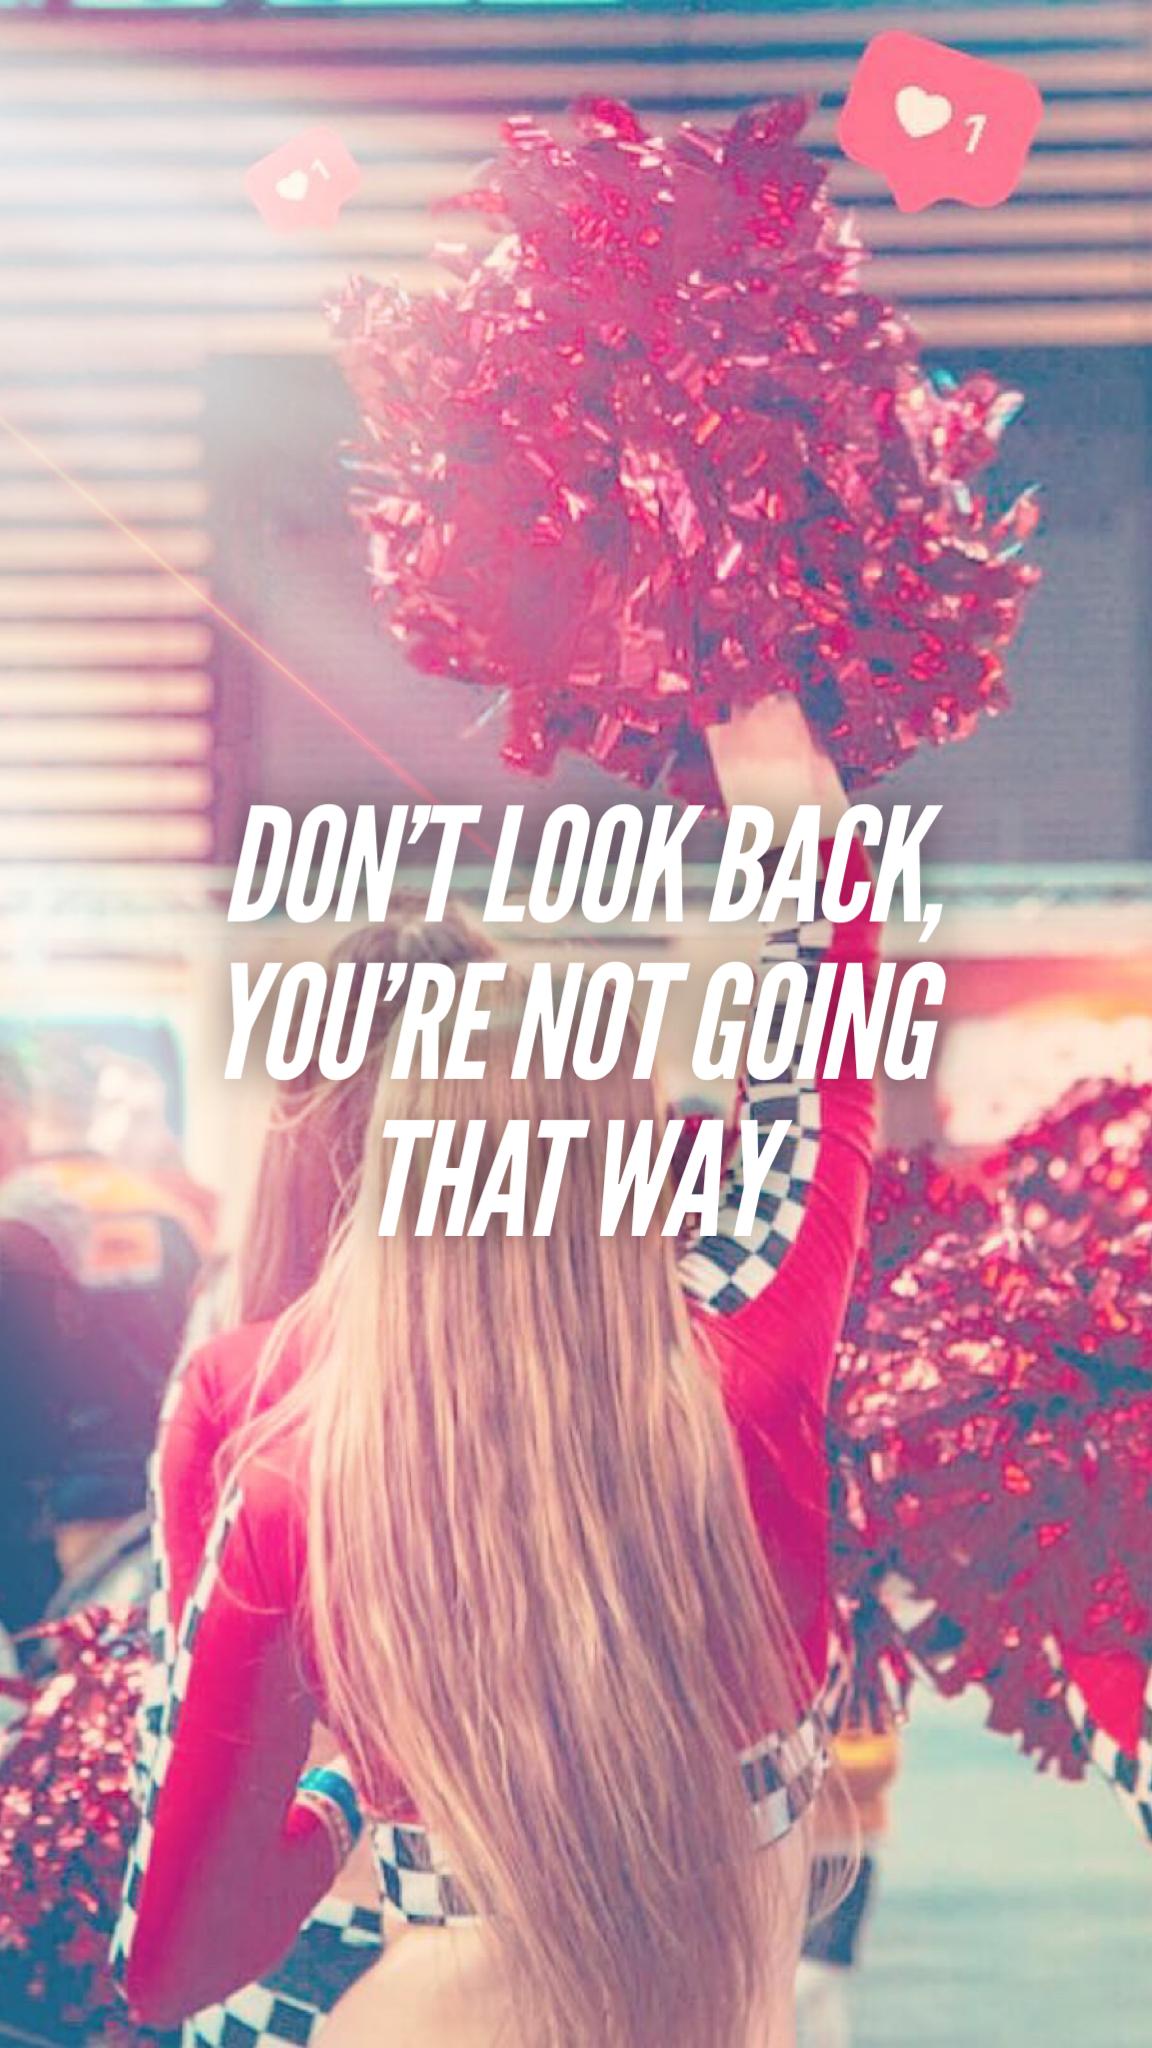 Shine S Girl Cheerleading Cheerleaders Wallpaper Iphone8plus Quotes Red Cheerleading Quotes Cute Girl Wallpaper Dont Touch My Phone Wallpapers